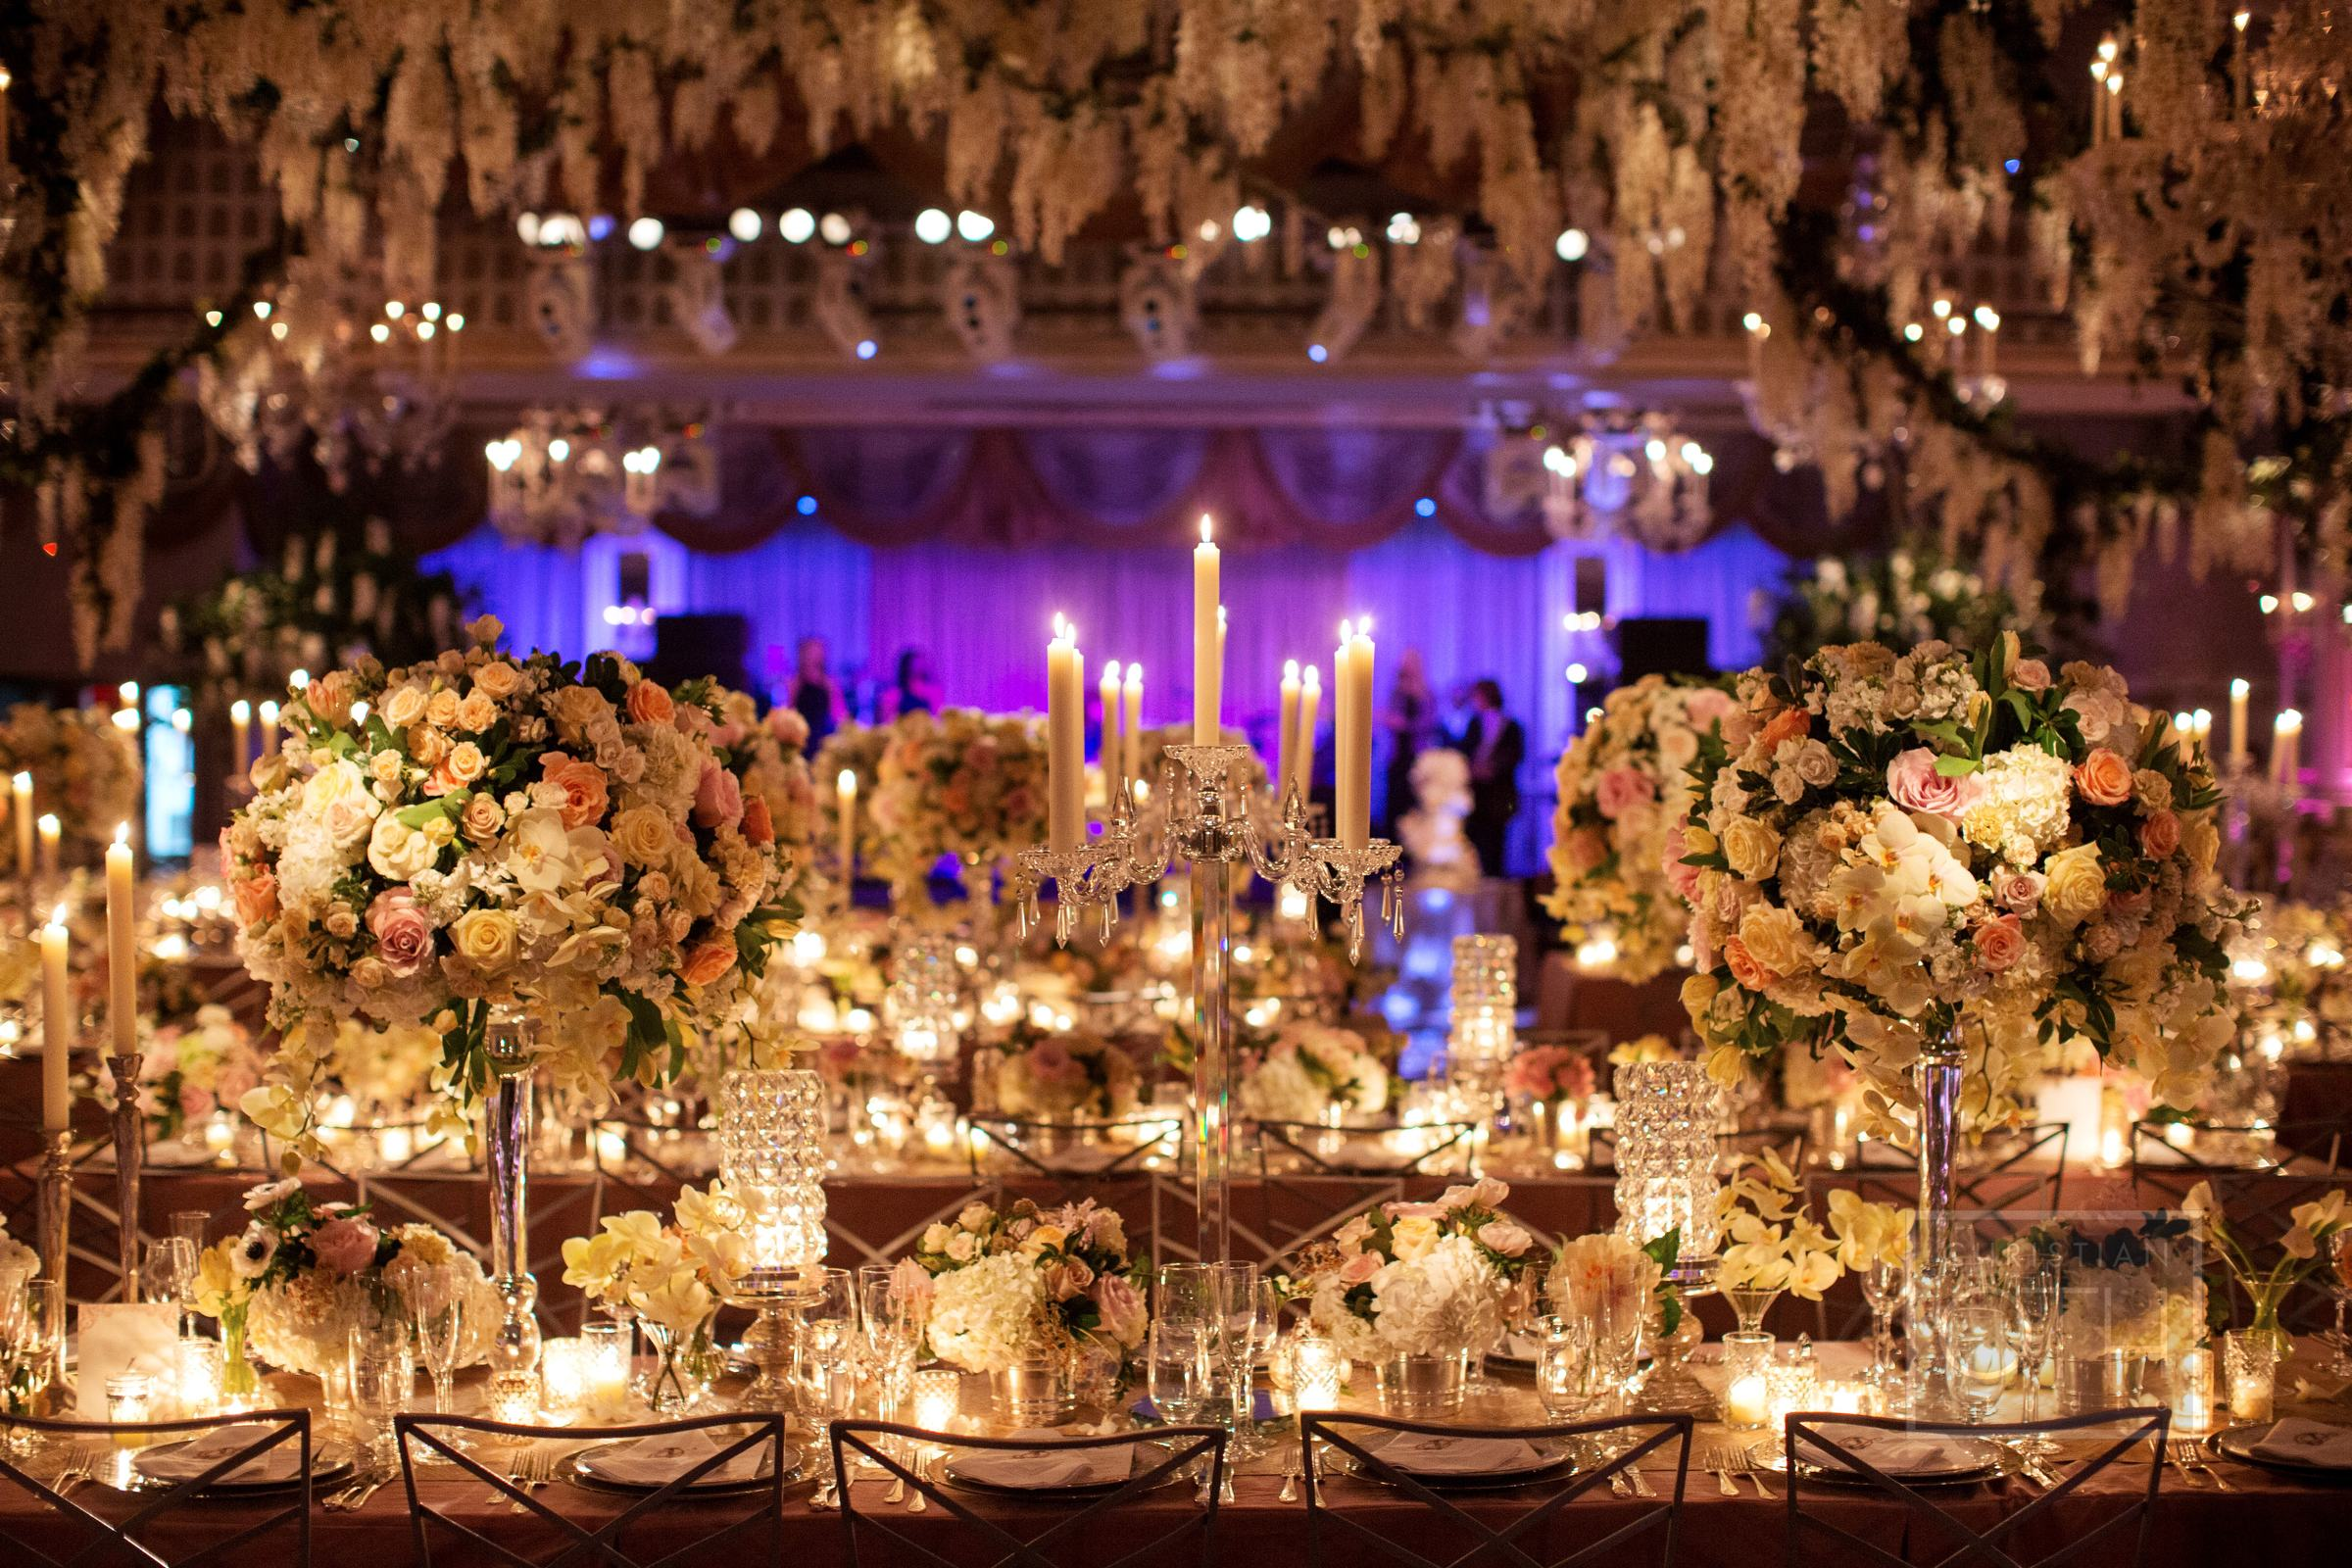 Ceci_New_York_Custom_Invitation_Pierre__City_ Destination_Wedding_Luxury_Personalized_Ceci_Style_Bride_Rose_Gold_Foil_Stamping128.JPG